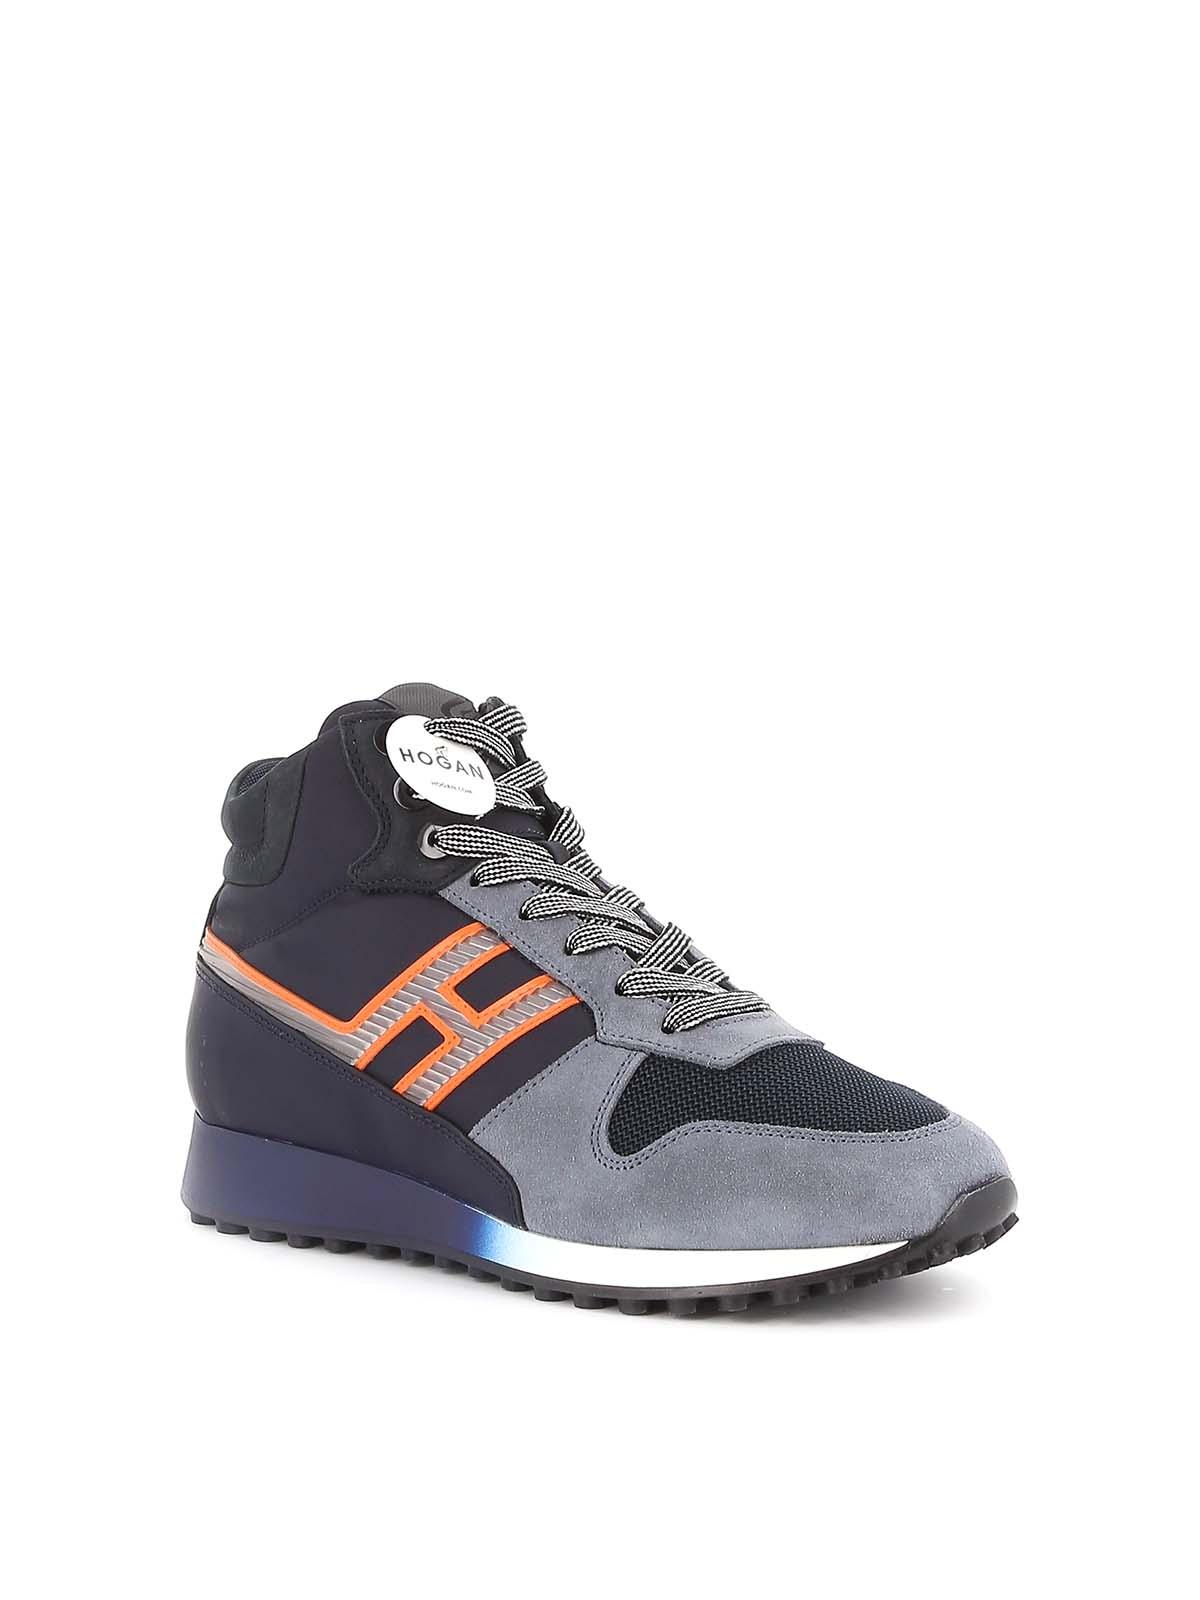 Hogan - H383 high top sneakers - trainers - HXM4790BX10LPI50B1 ...